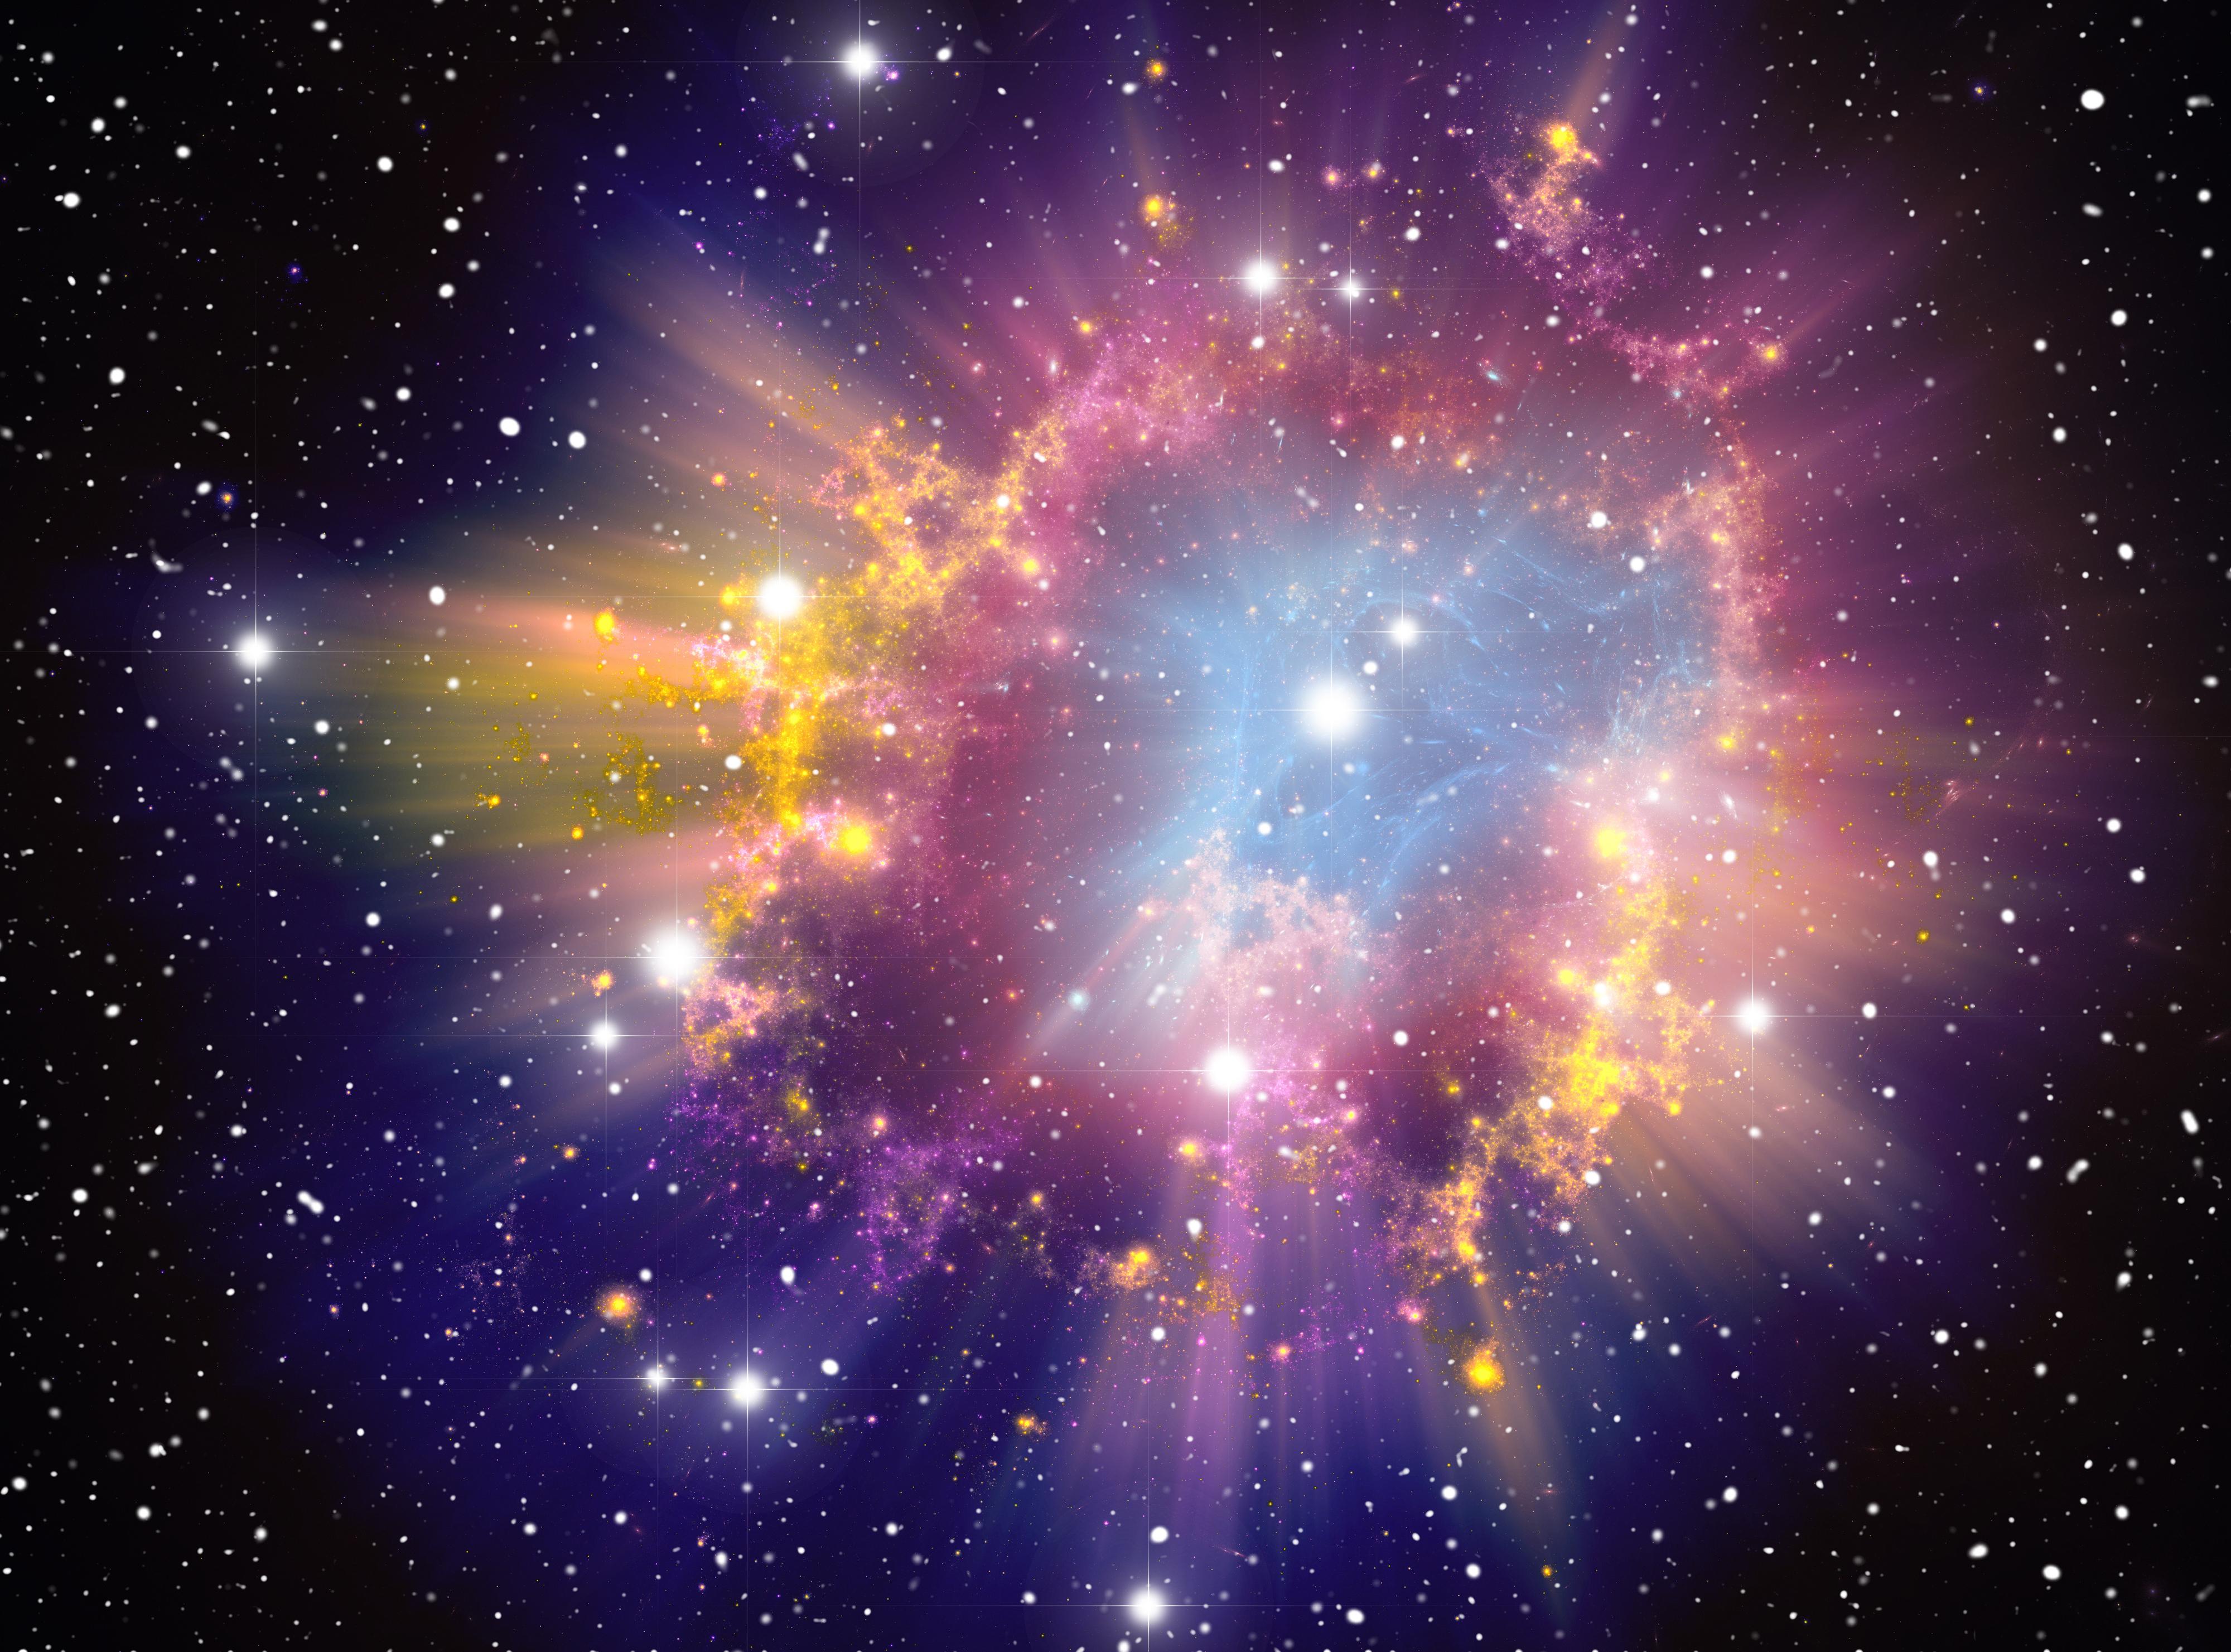 colorful universe poster  beautiful  universe  dream